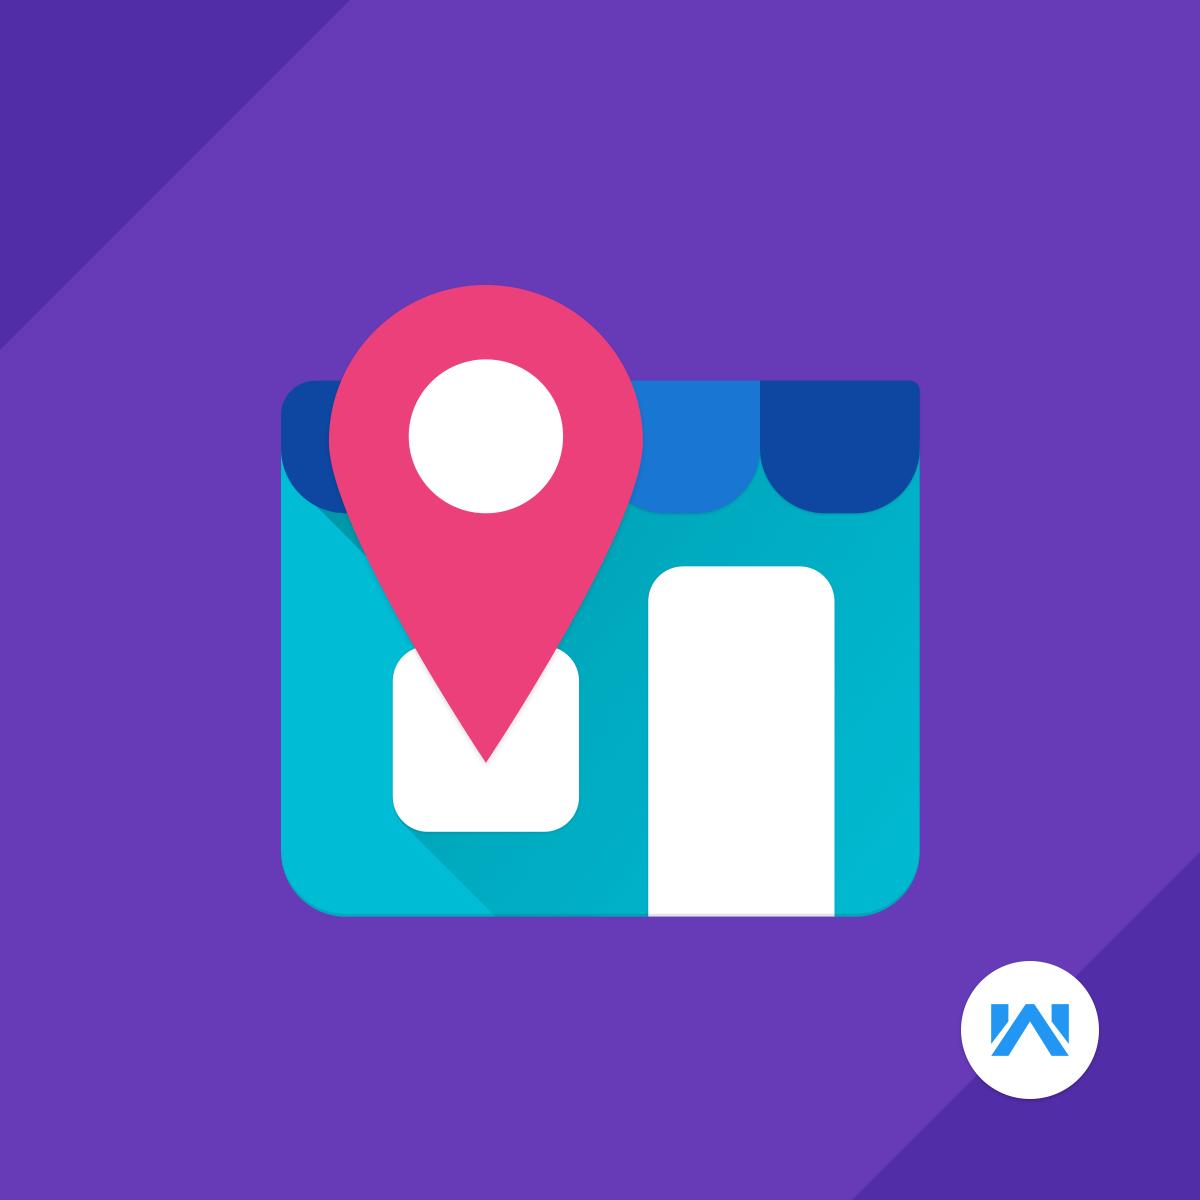 Shopify Google Maps app by Webkul software pvt ltd